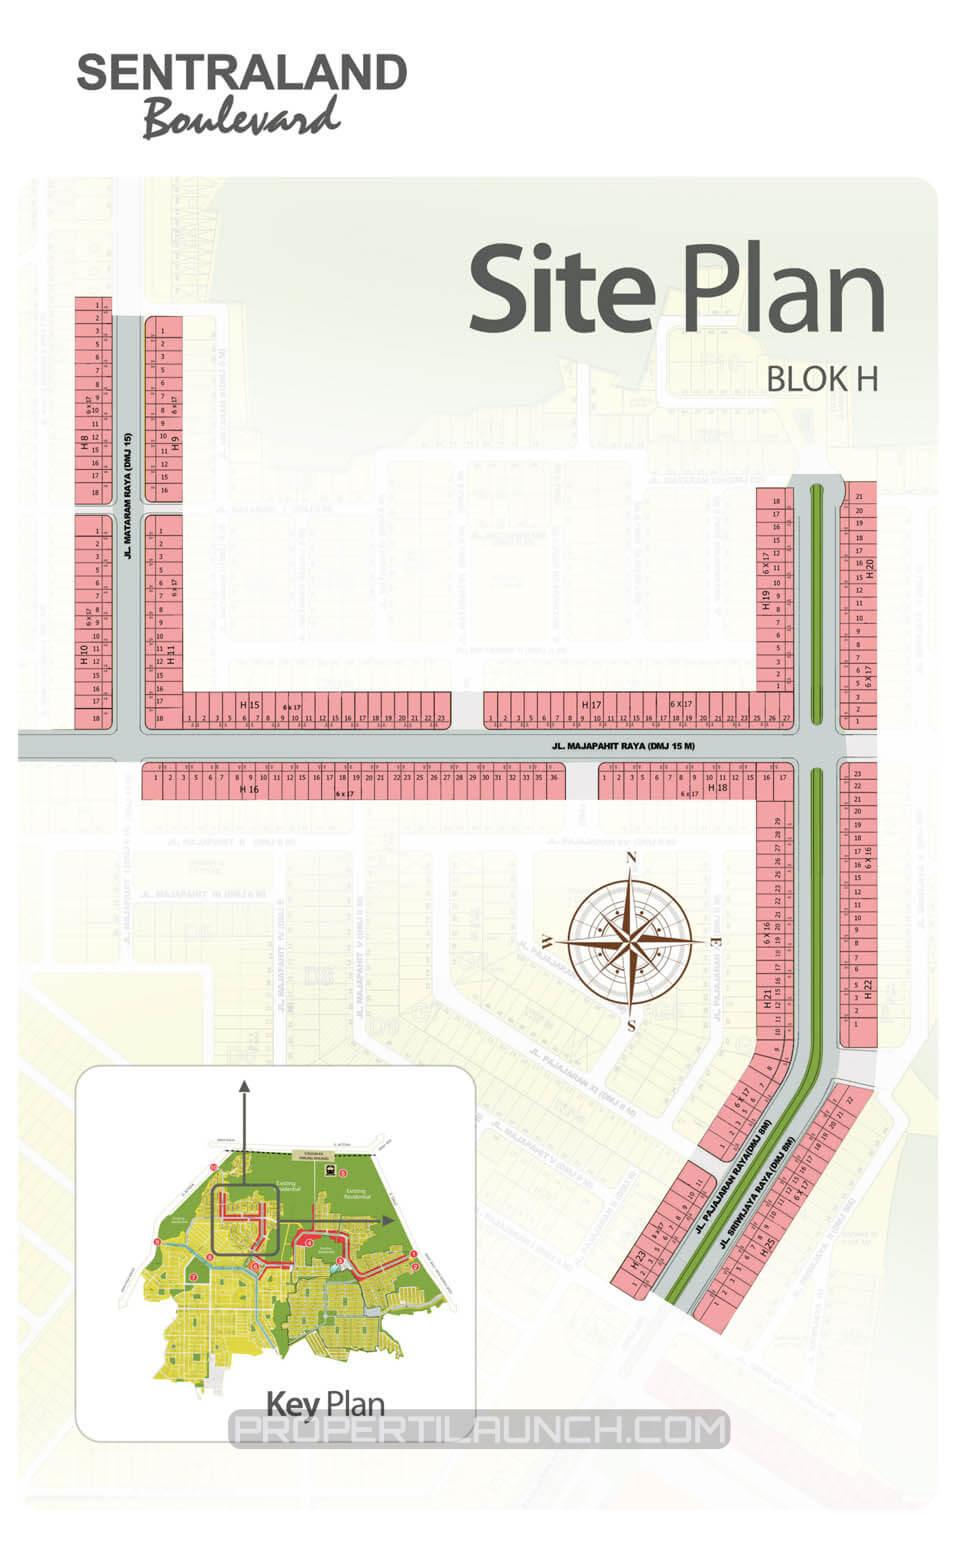 Siteplan Sentraland Boulevard